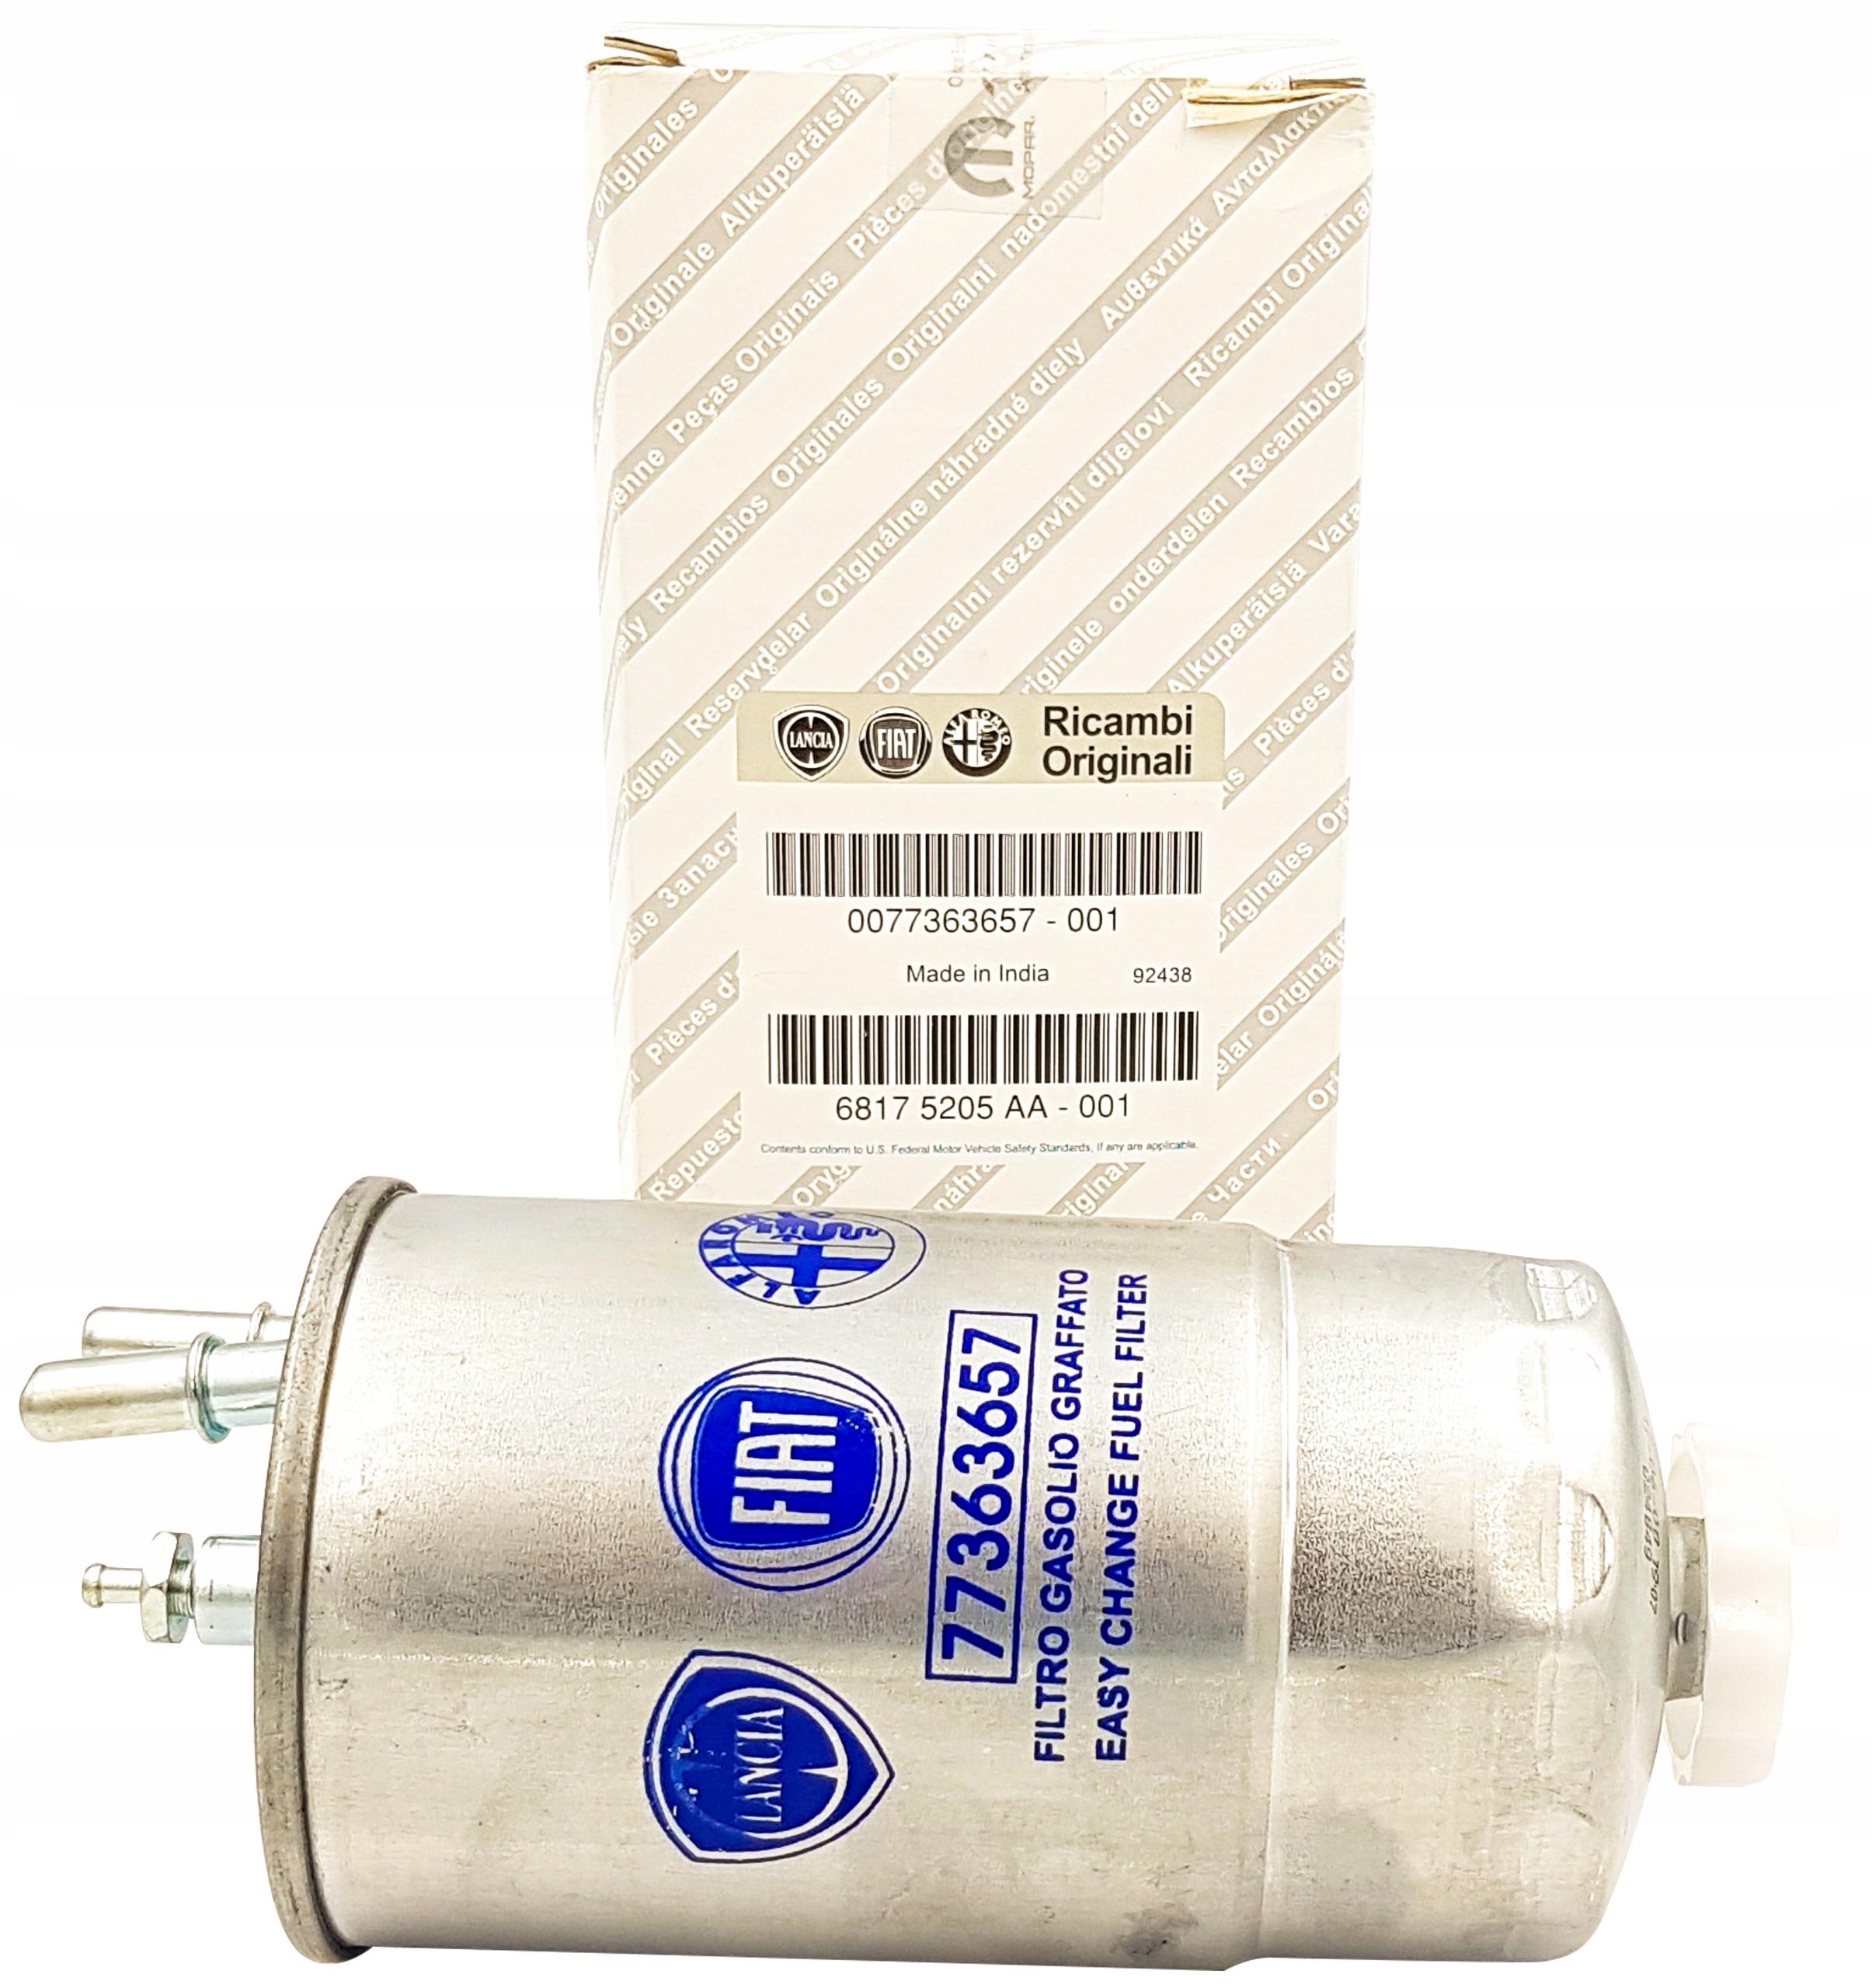 альфа romeo 159 брера 19 20 jtdm фильтр топлива